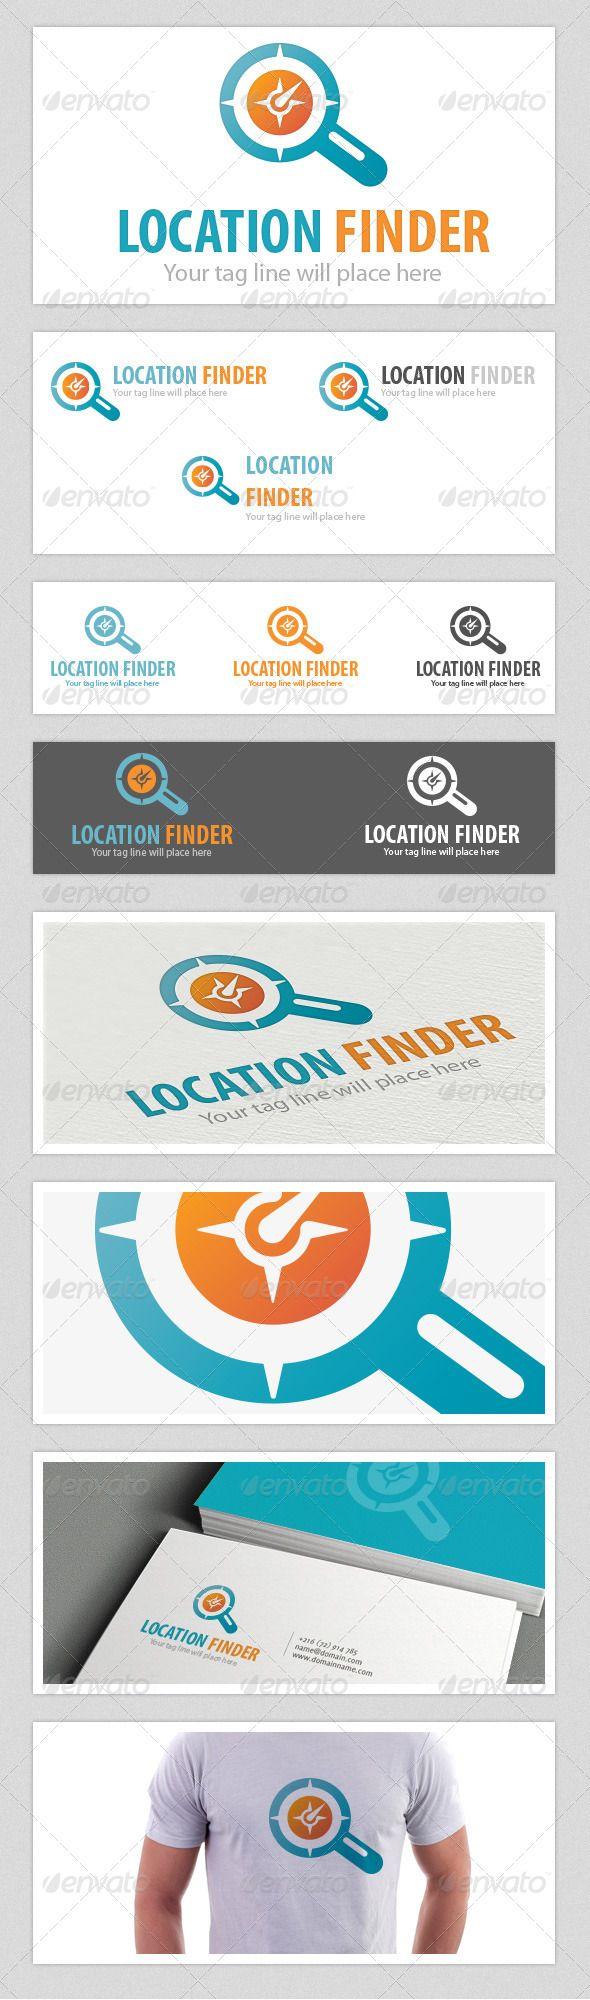 Location Finder  Logo Design Template Vector #logotype Download it here: http://graphicriver.net/item/location-finder-logo/4541458?s_rank=722?ref=nexion